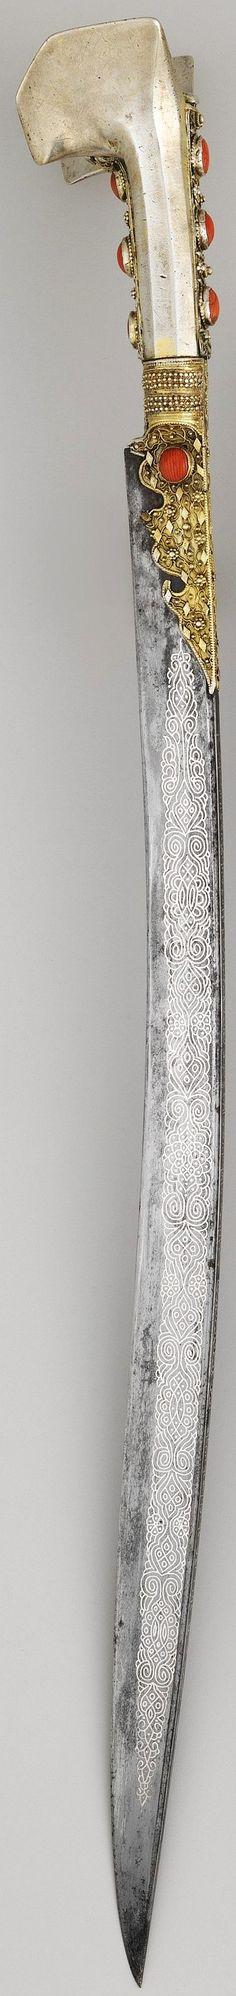 Ottoman (Anatolian or Balkan) yatagan / yataghan, dated steel, silver… Swords And Daggers, Knives And Swords, Katana, Ancient Armor, Cool Swords, Arm Armor, Fantasy Weapons, Ottoman Empire, Blade